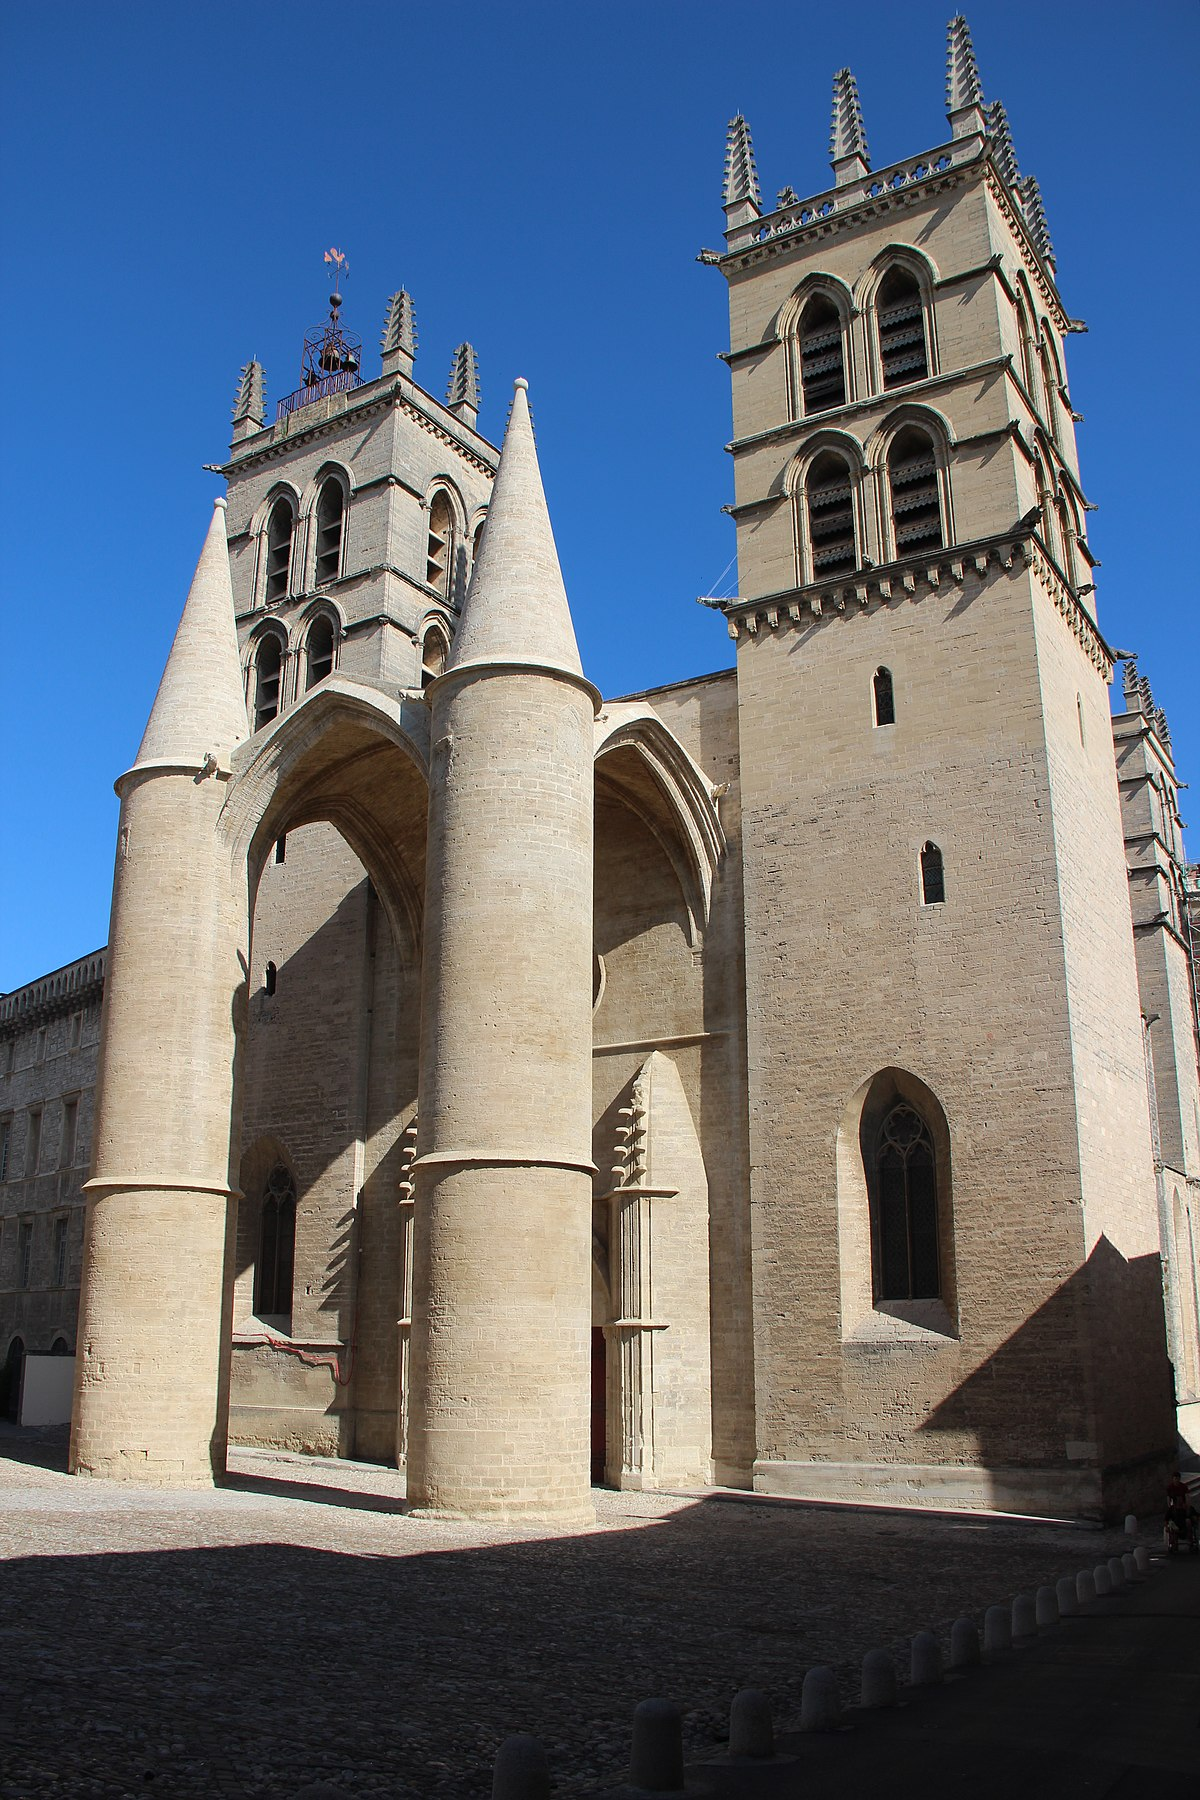 Cath drale saint pierre de montpellier wikip dia - Cathedrale saint pierre de montpellier ...